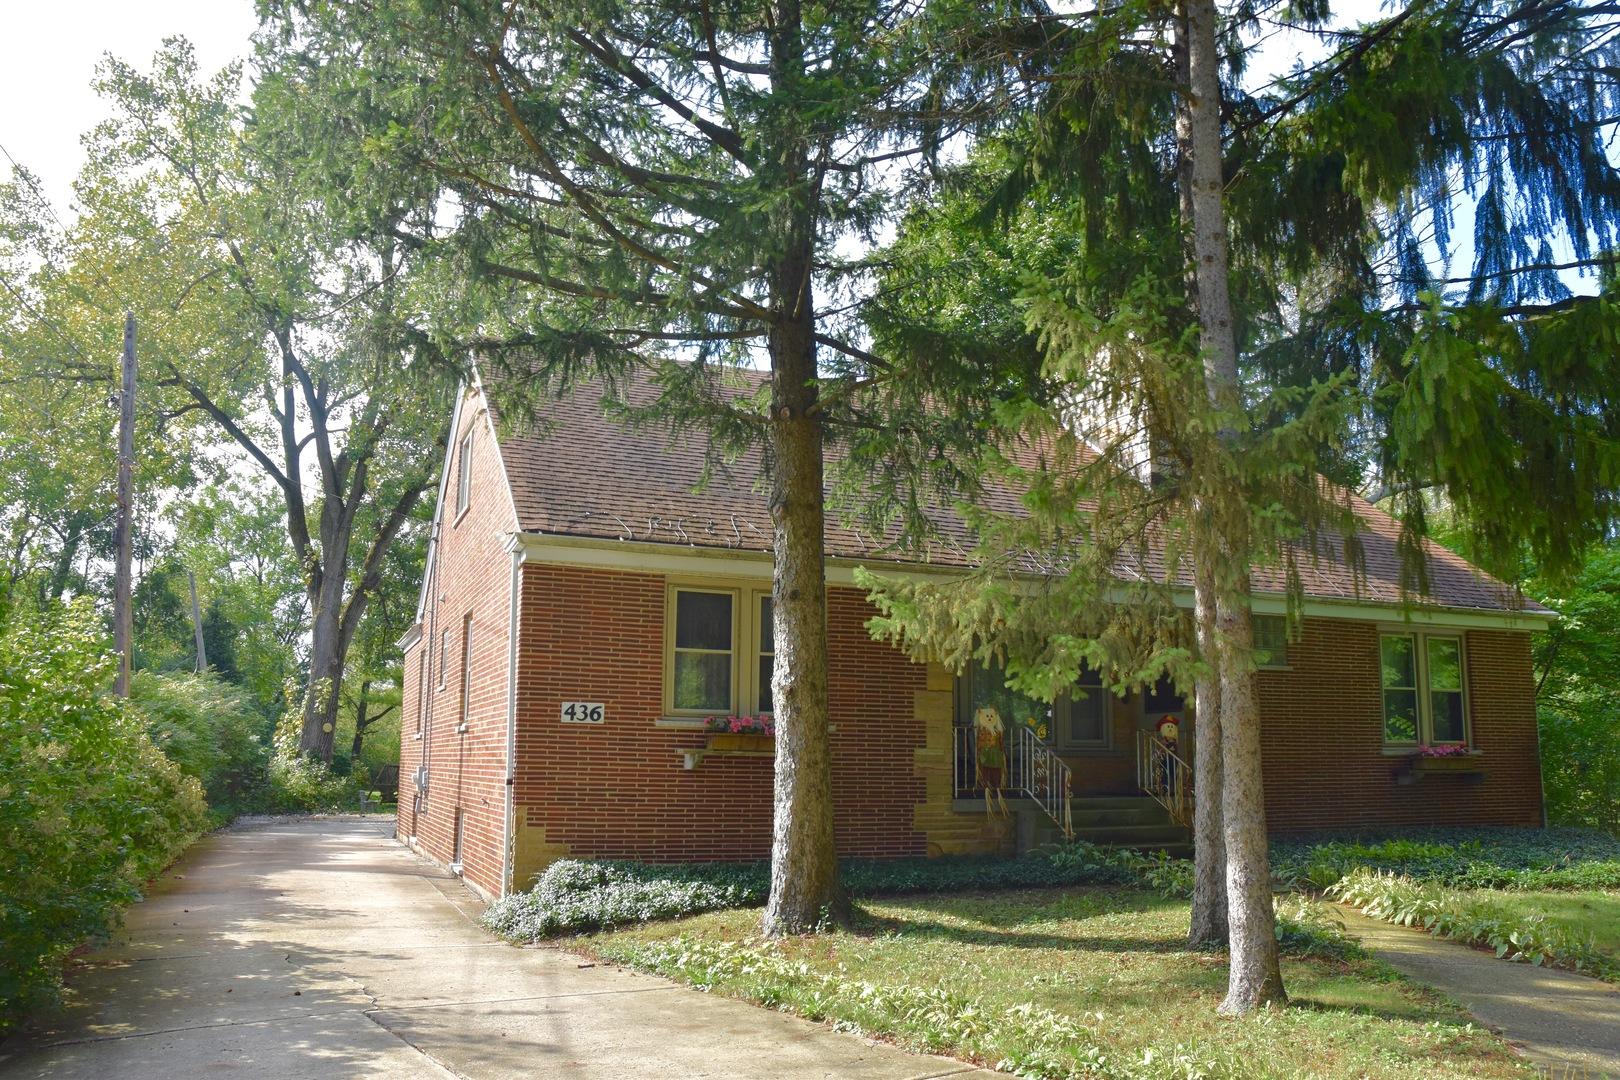 436 Grove, Wood Dale, Illinois, 60191